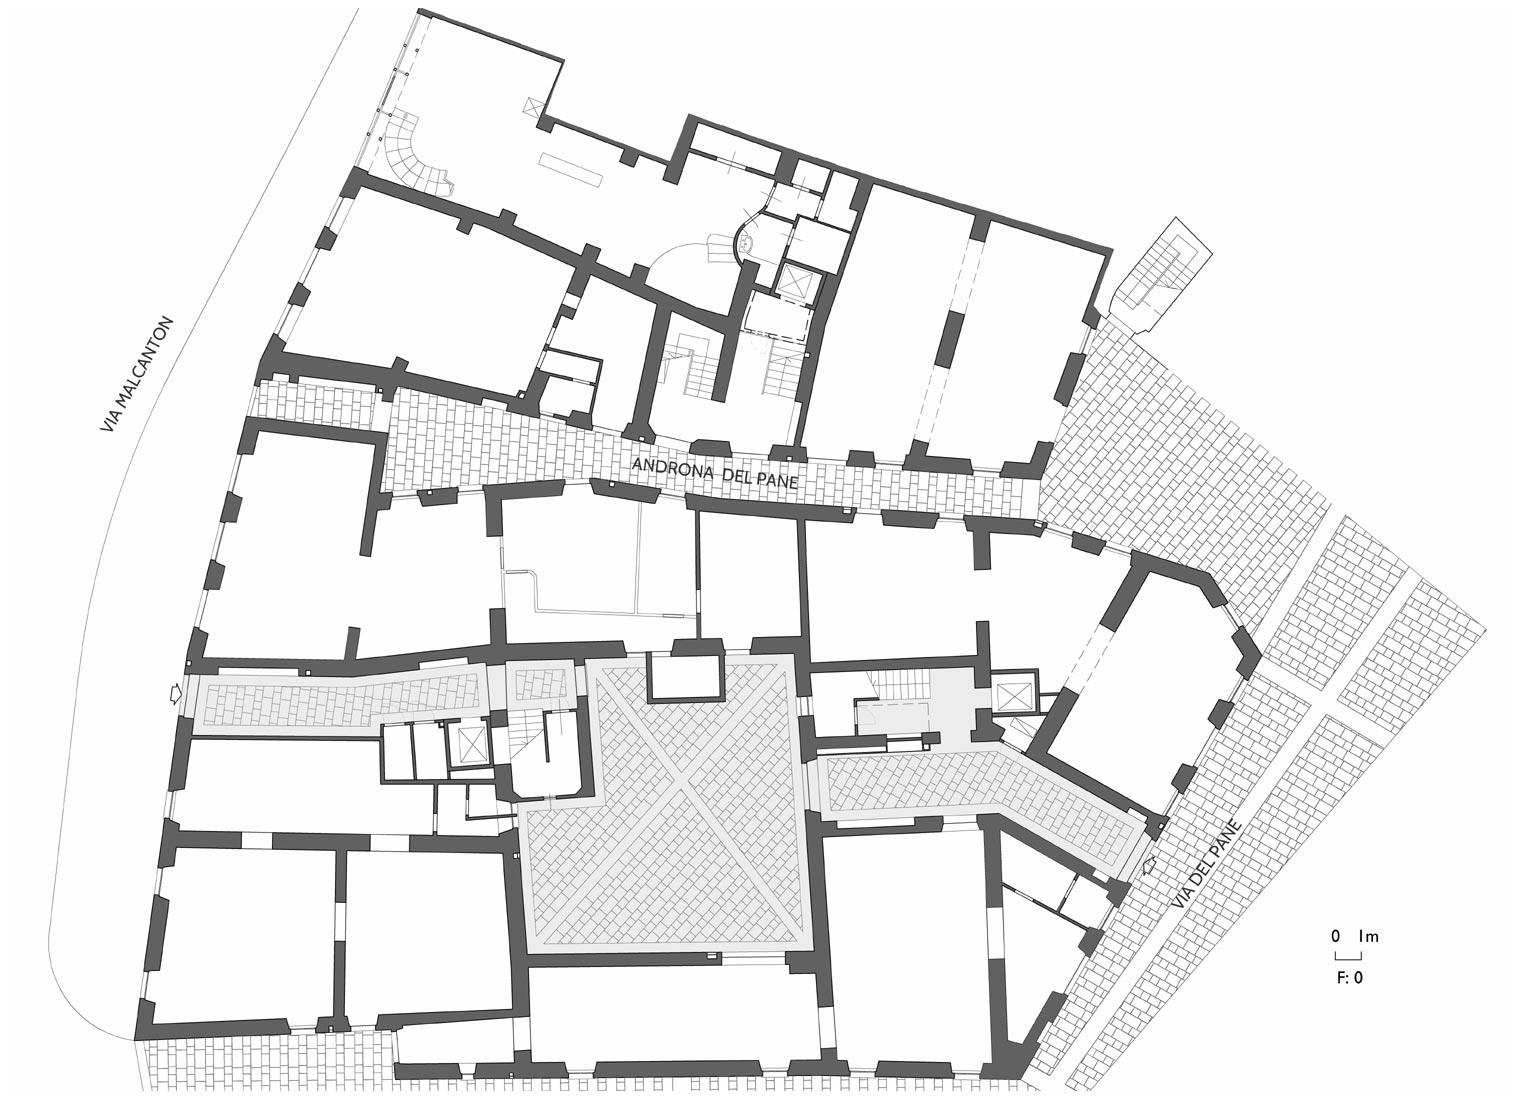 vk-architetti_malcanton_plan